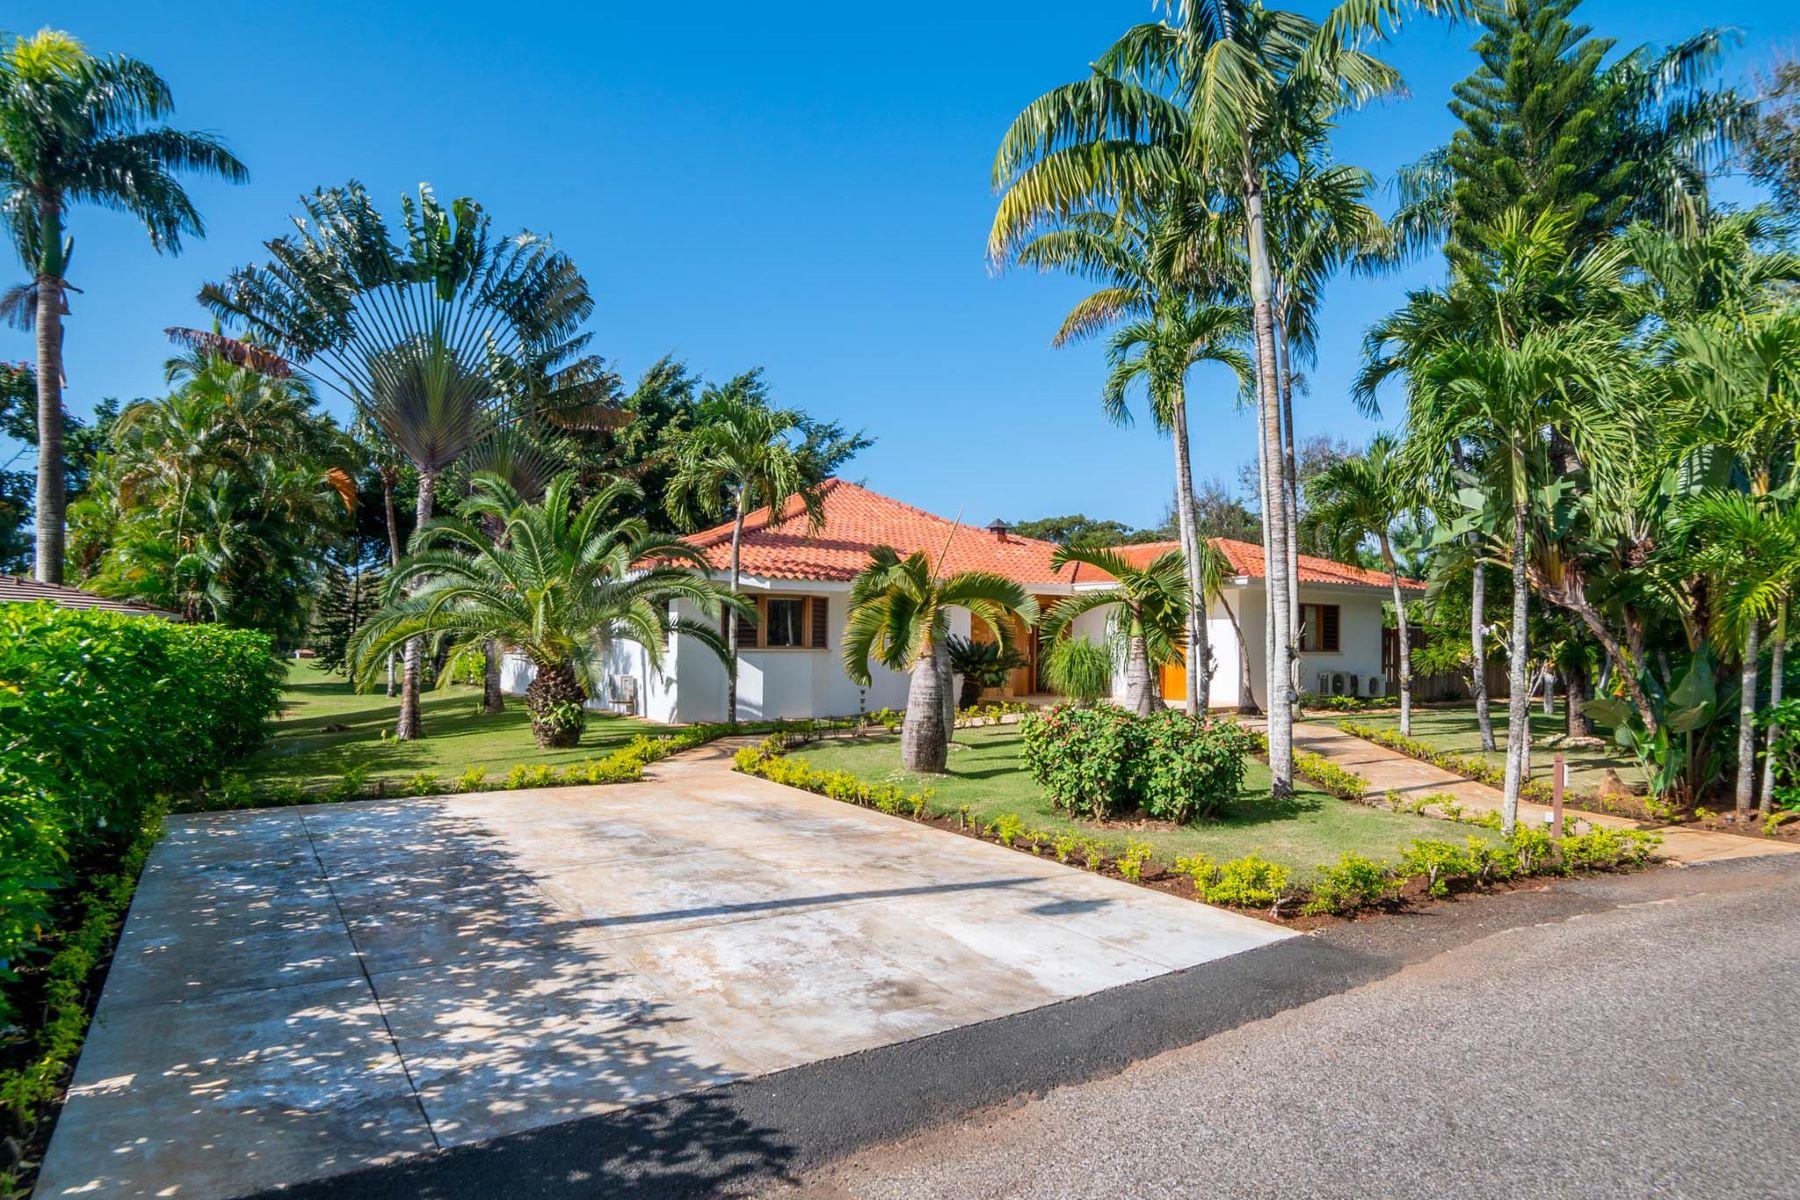 Single Family Home for Sale at Modern, High Quality, Easy and Fun Golf Residence Casa De Campo, La Romana Dominican Republic